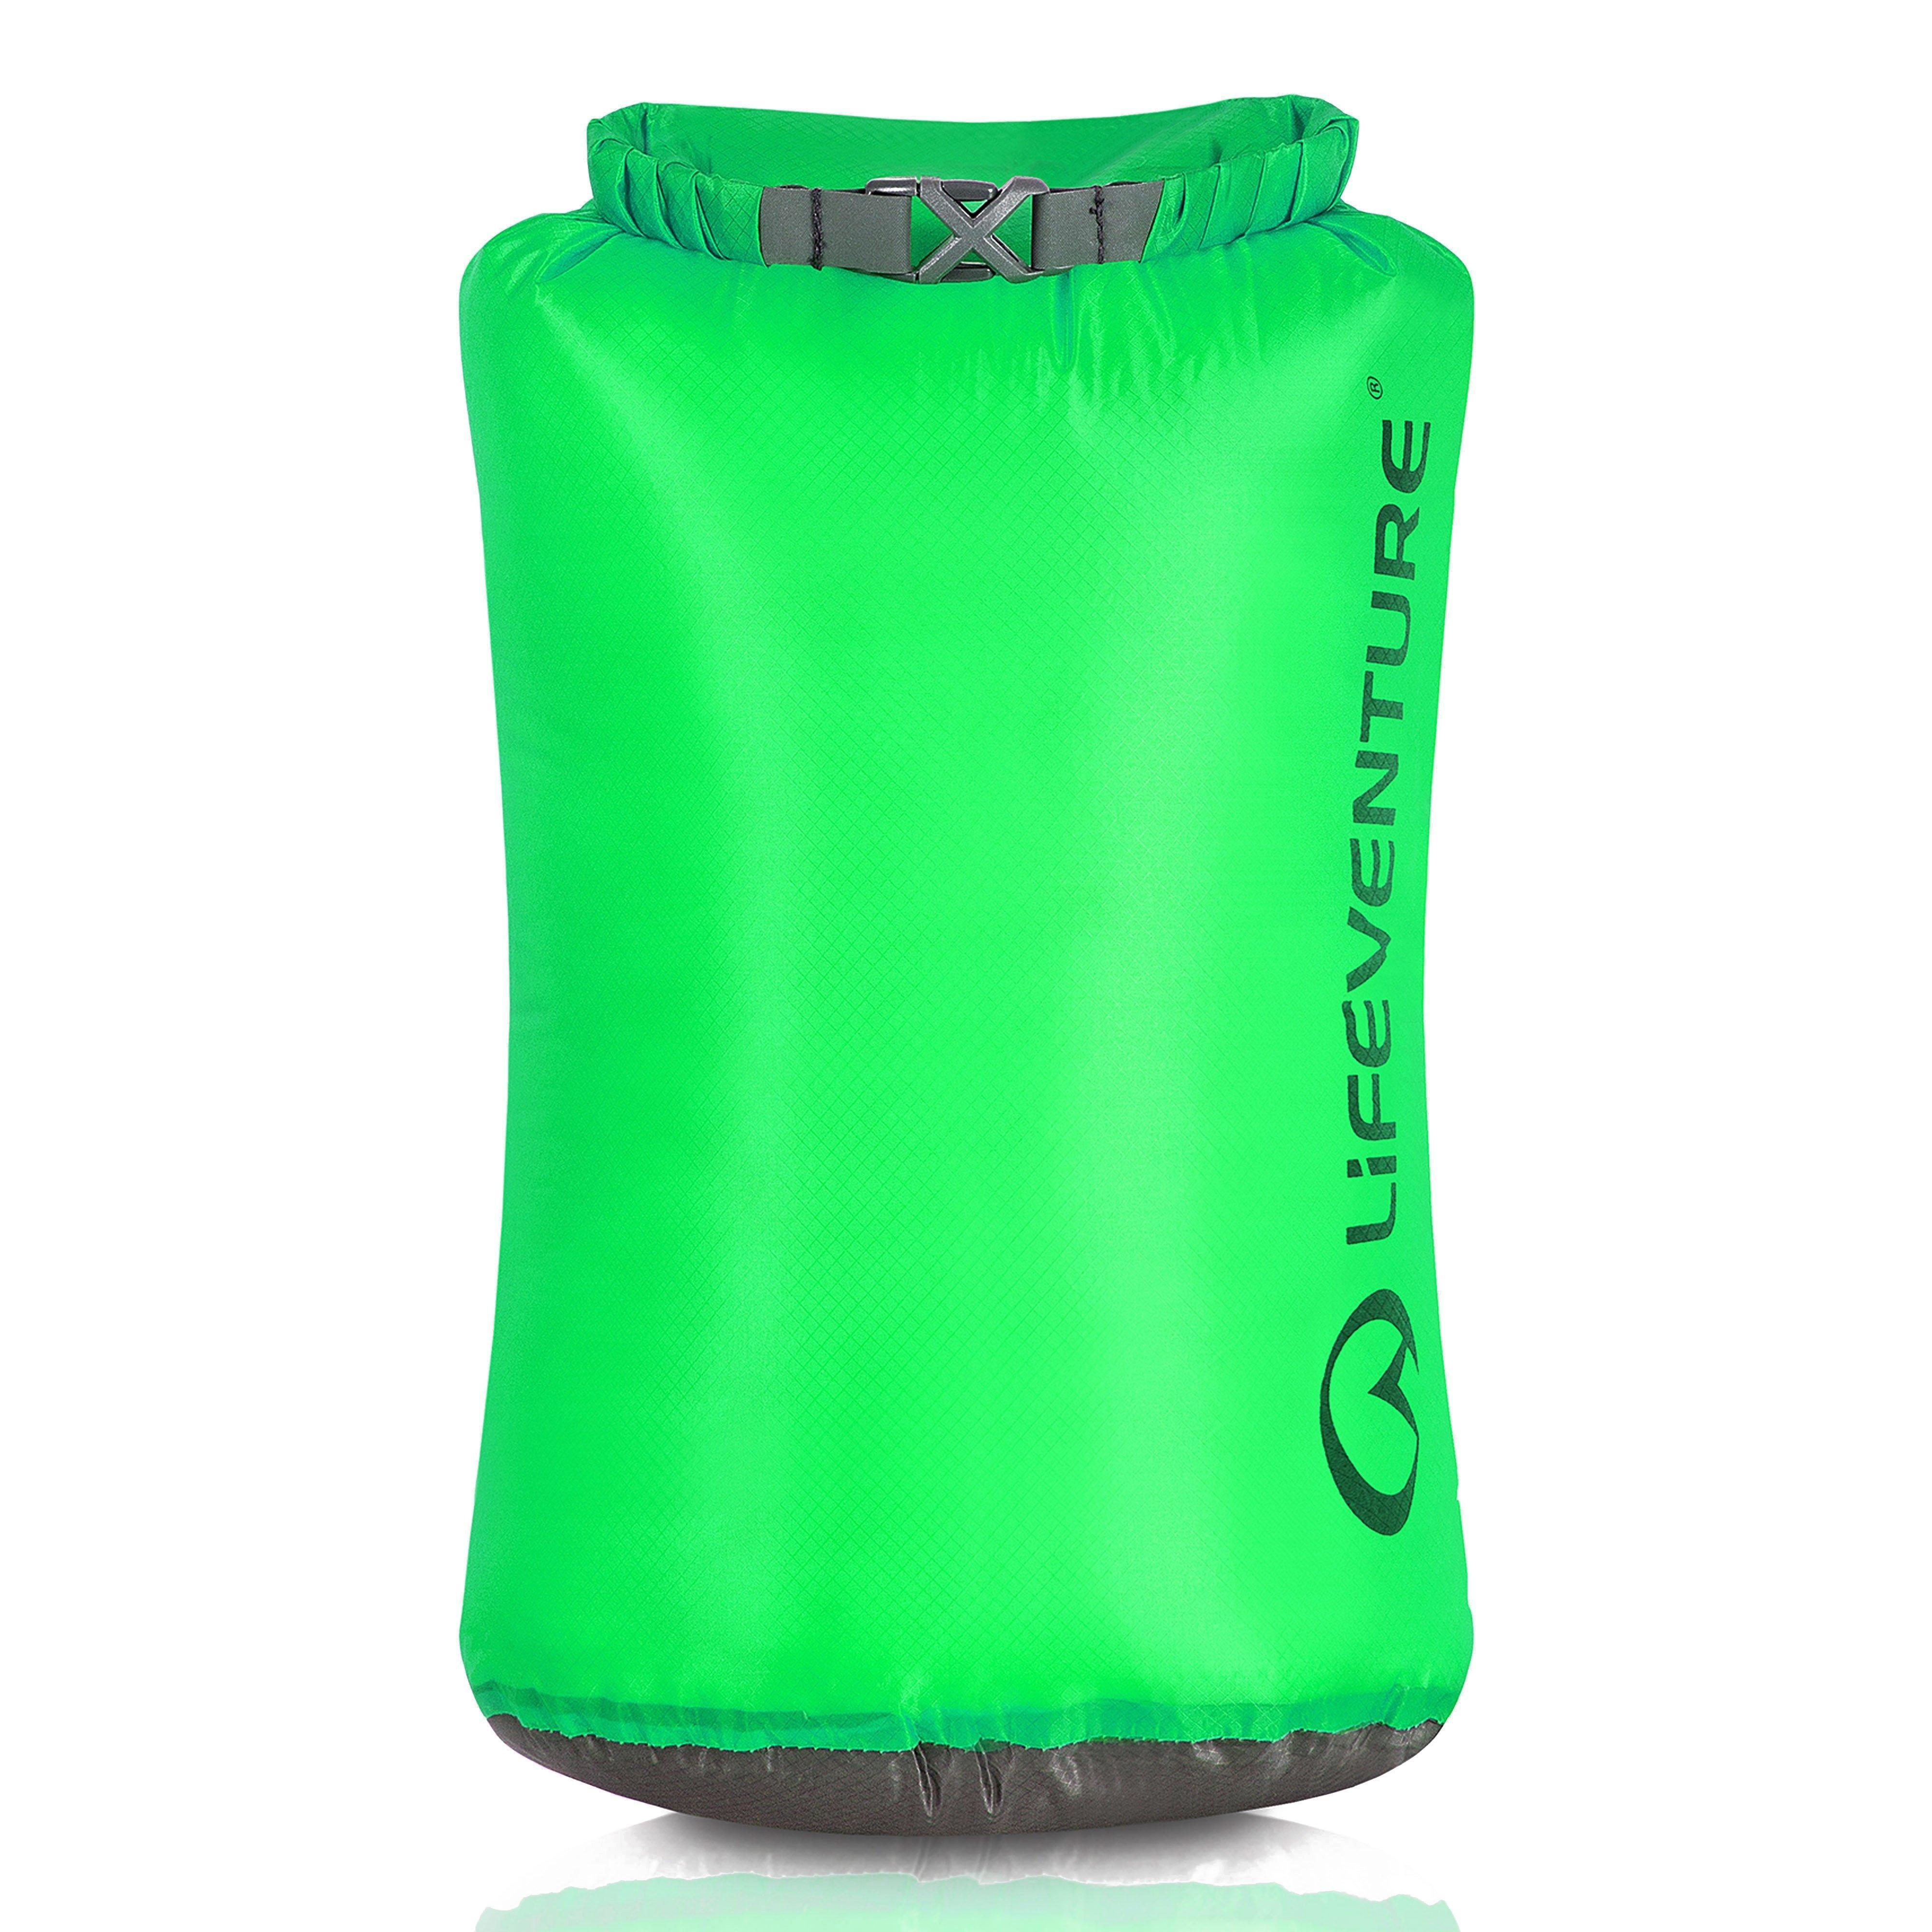 Lifeventure Lifeventure Ultralight 10L Dry Bag - N/A, N/A